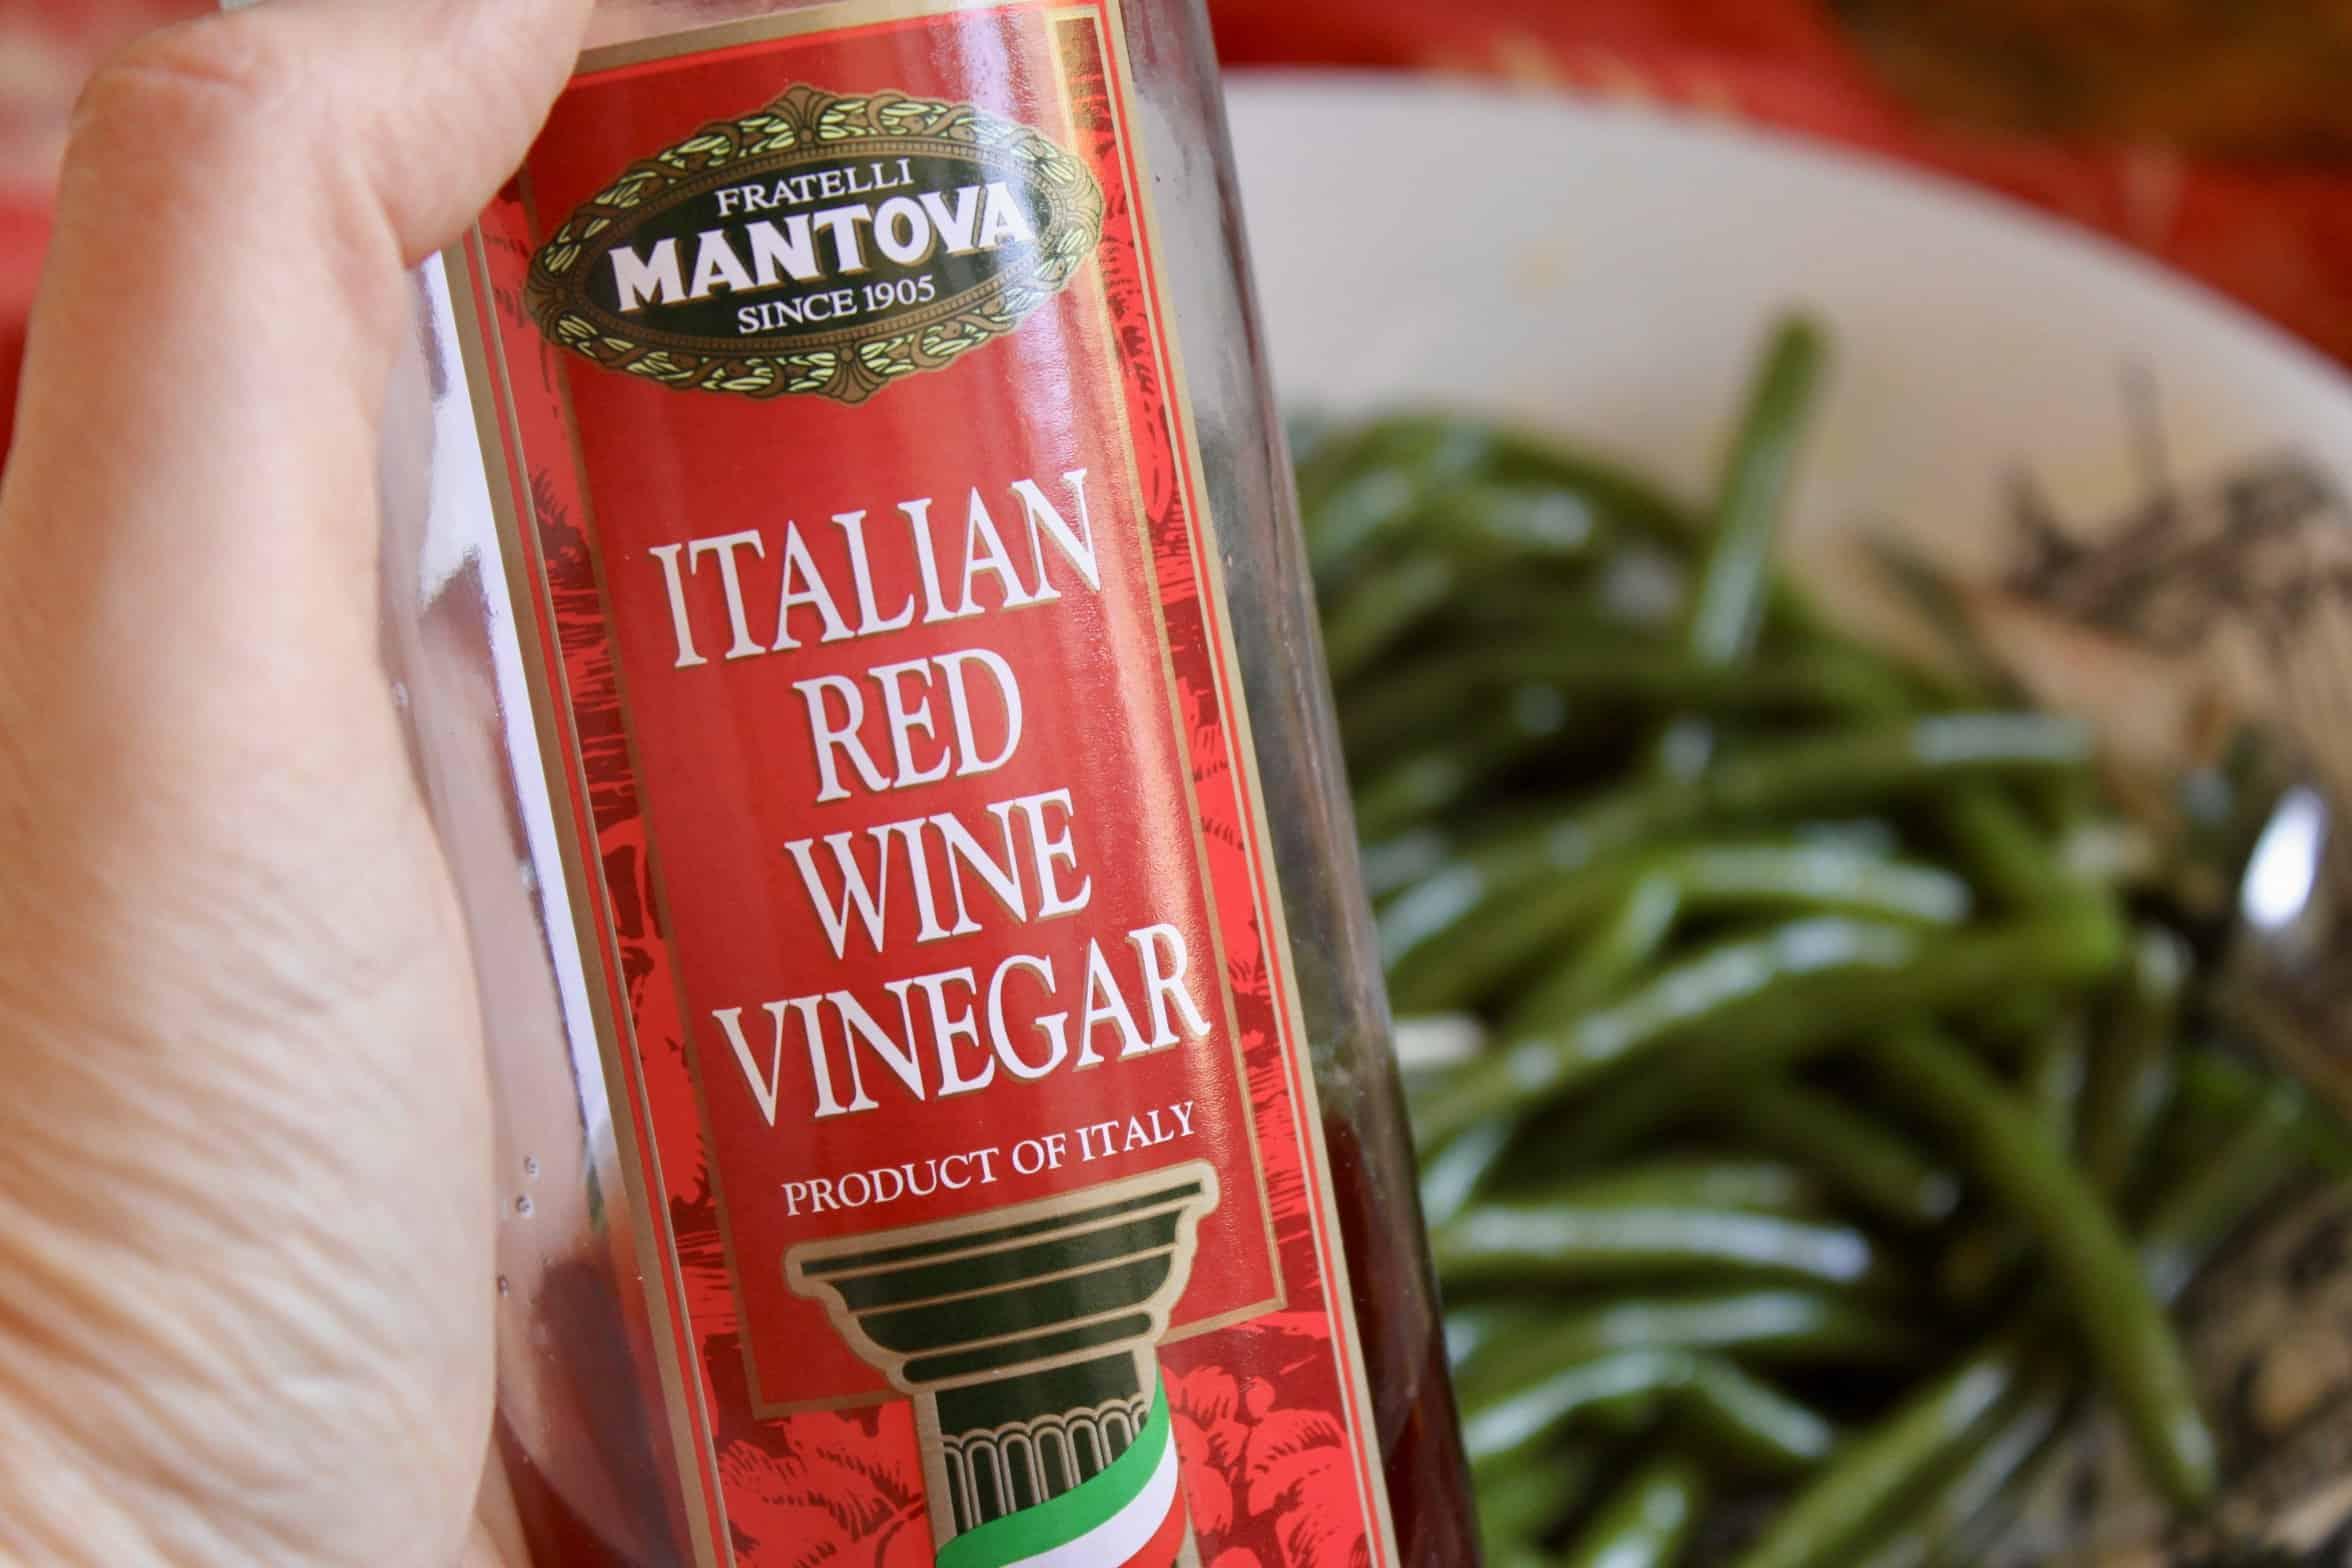 Italian red wine vinegar